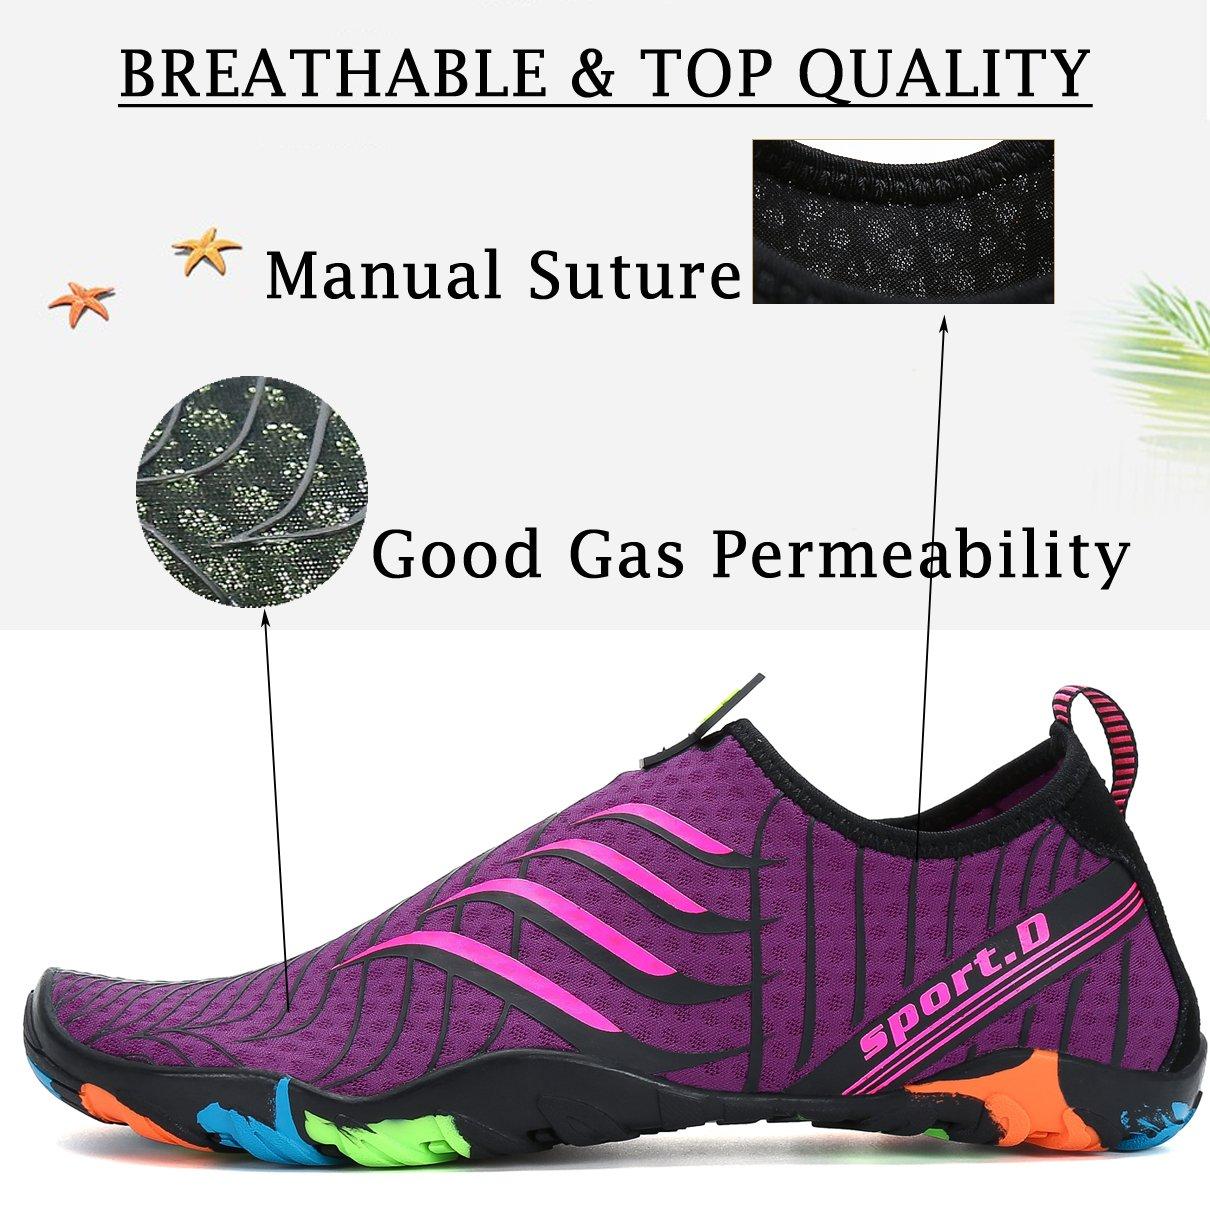 4ac0b6ad También son yoga zapatos, calzado deportivo, zapatos para correr de playa,  zapatos de buceo, surf zapatos, canotaje zapatos, zapatos de verano.